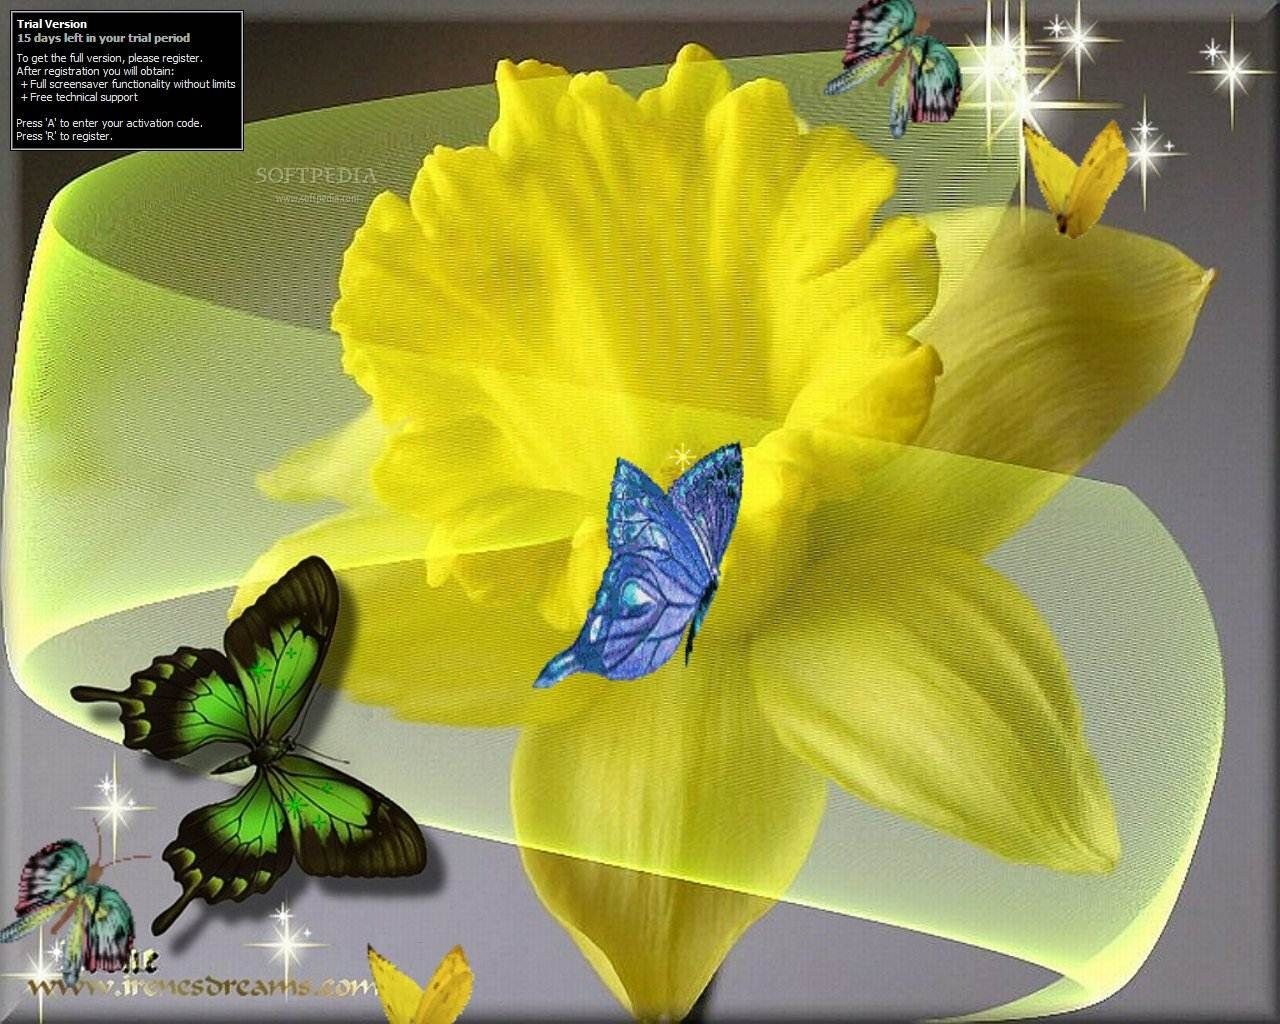 Butterfly Daffodil Screensaver screenshot 2 - The Butterfly Daffodil Screensaver will display on your desktop daffodil and butterflies that ...